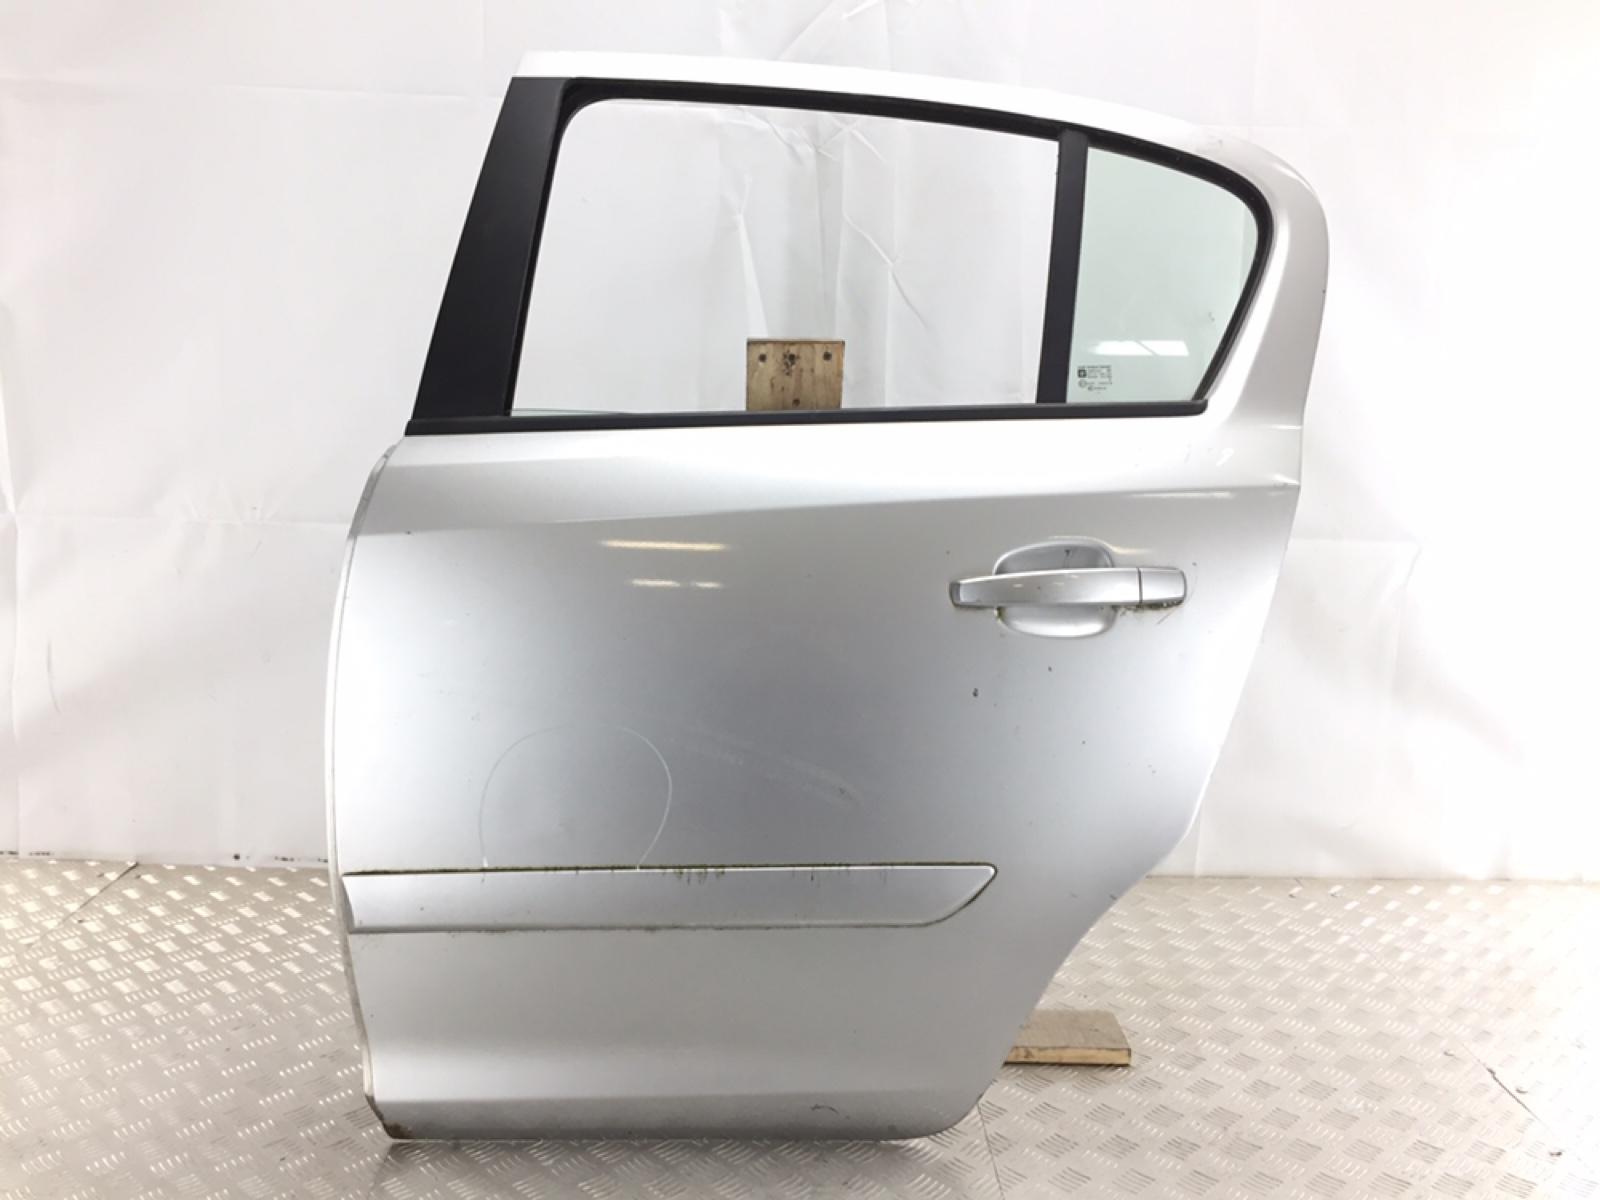 Дверь задняя левая Opel Corsa D 1.4 I 2007 (б/у)